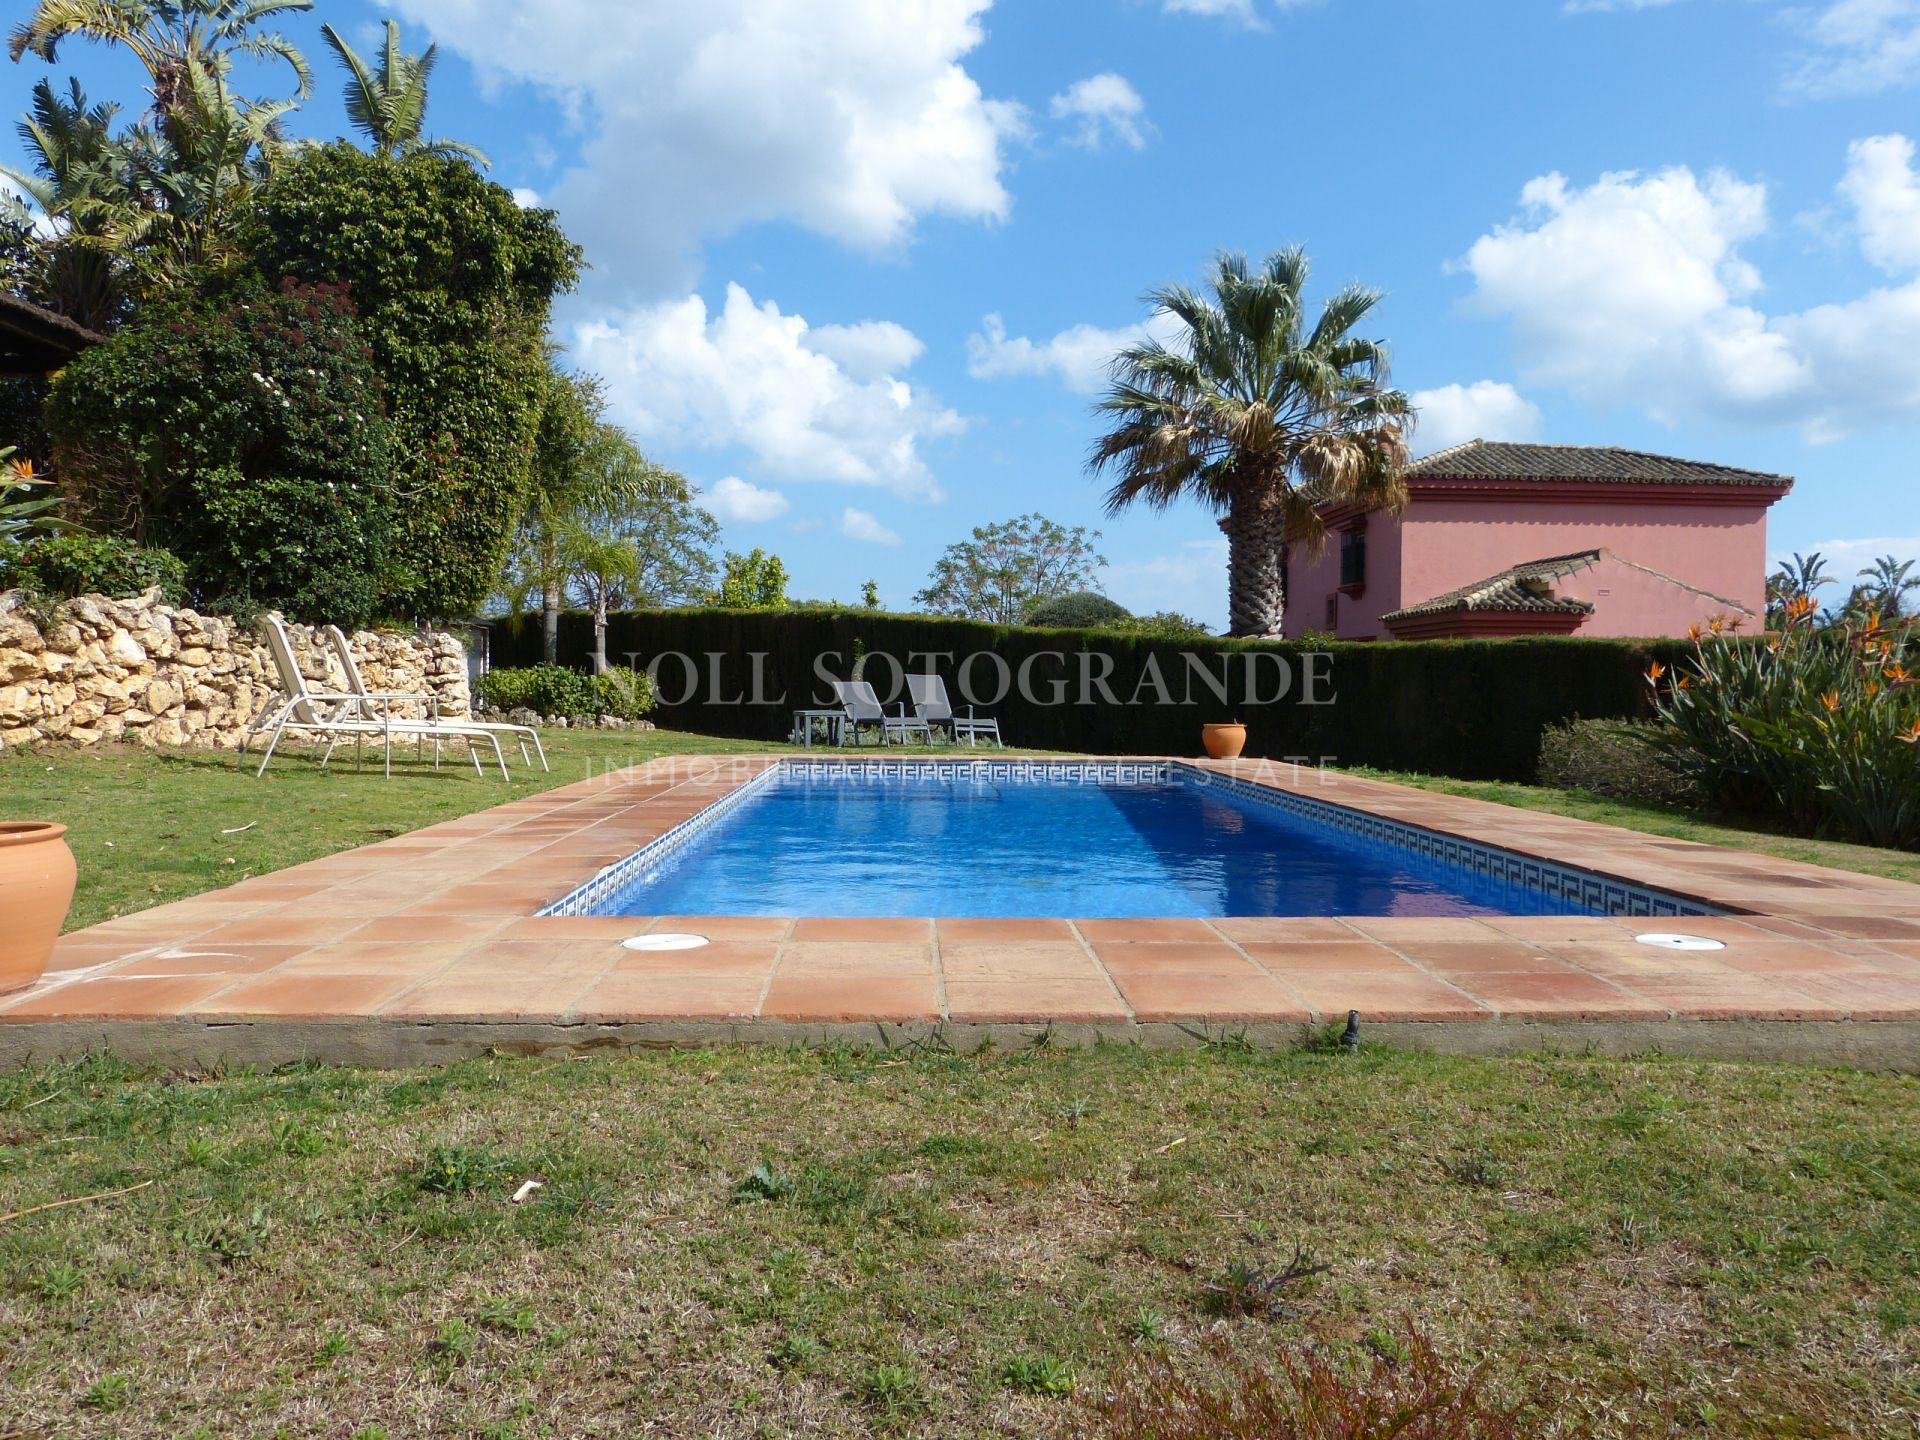 Rental villa next to Sotogrande International School